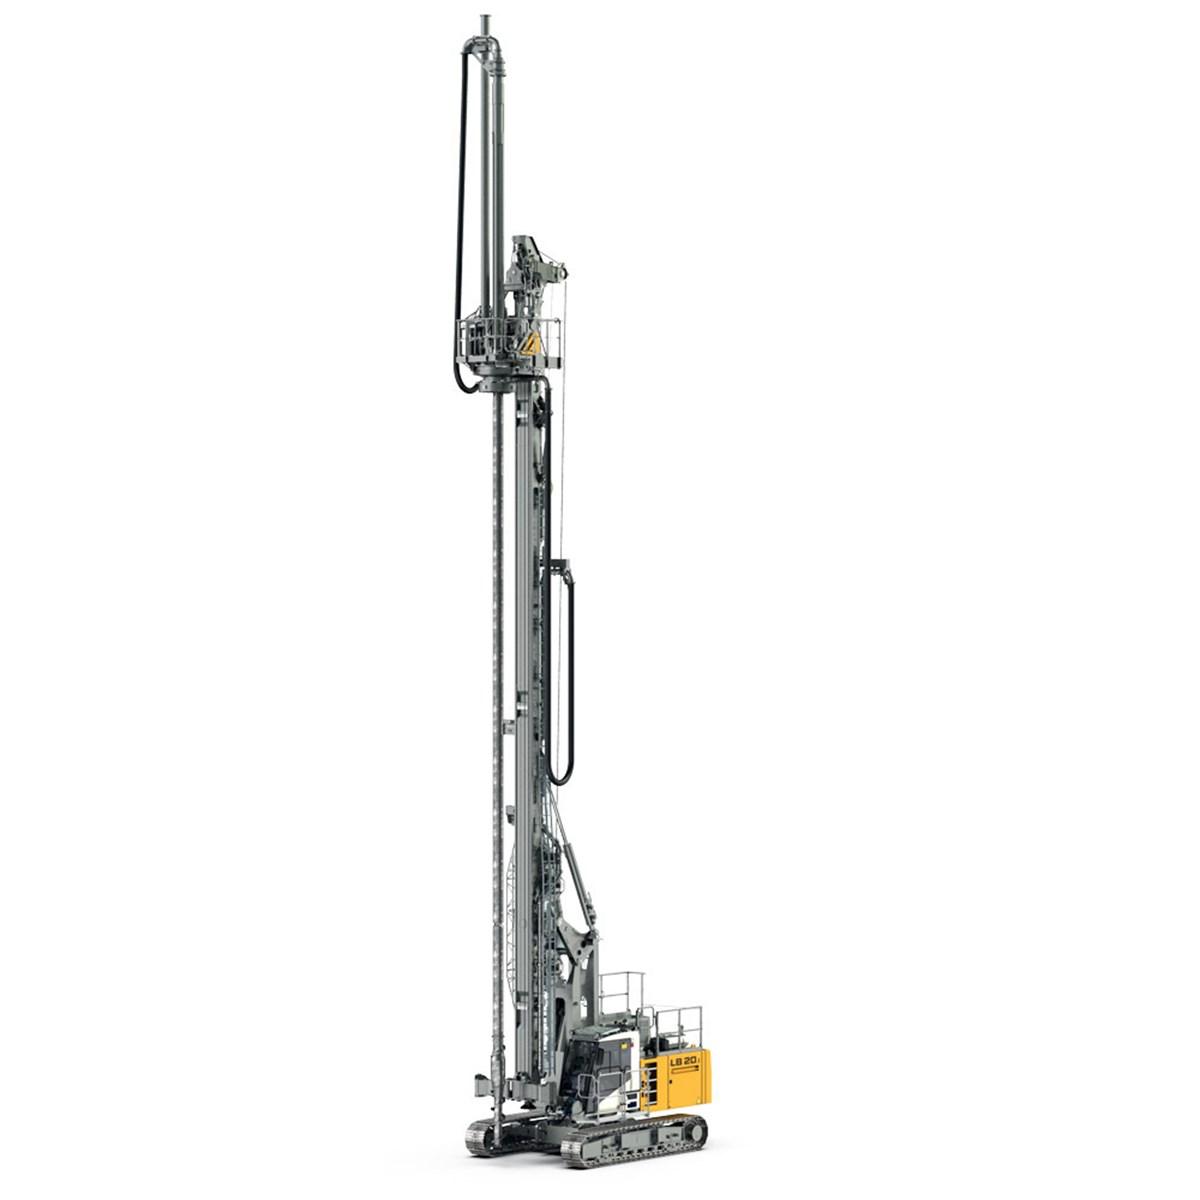 liebherr-lb-20-drilling-rig-drehbohrgeraet-fluu-displacement-vollverdraenger-1.jpg